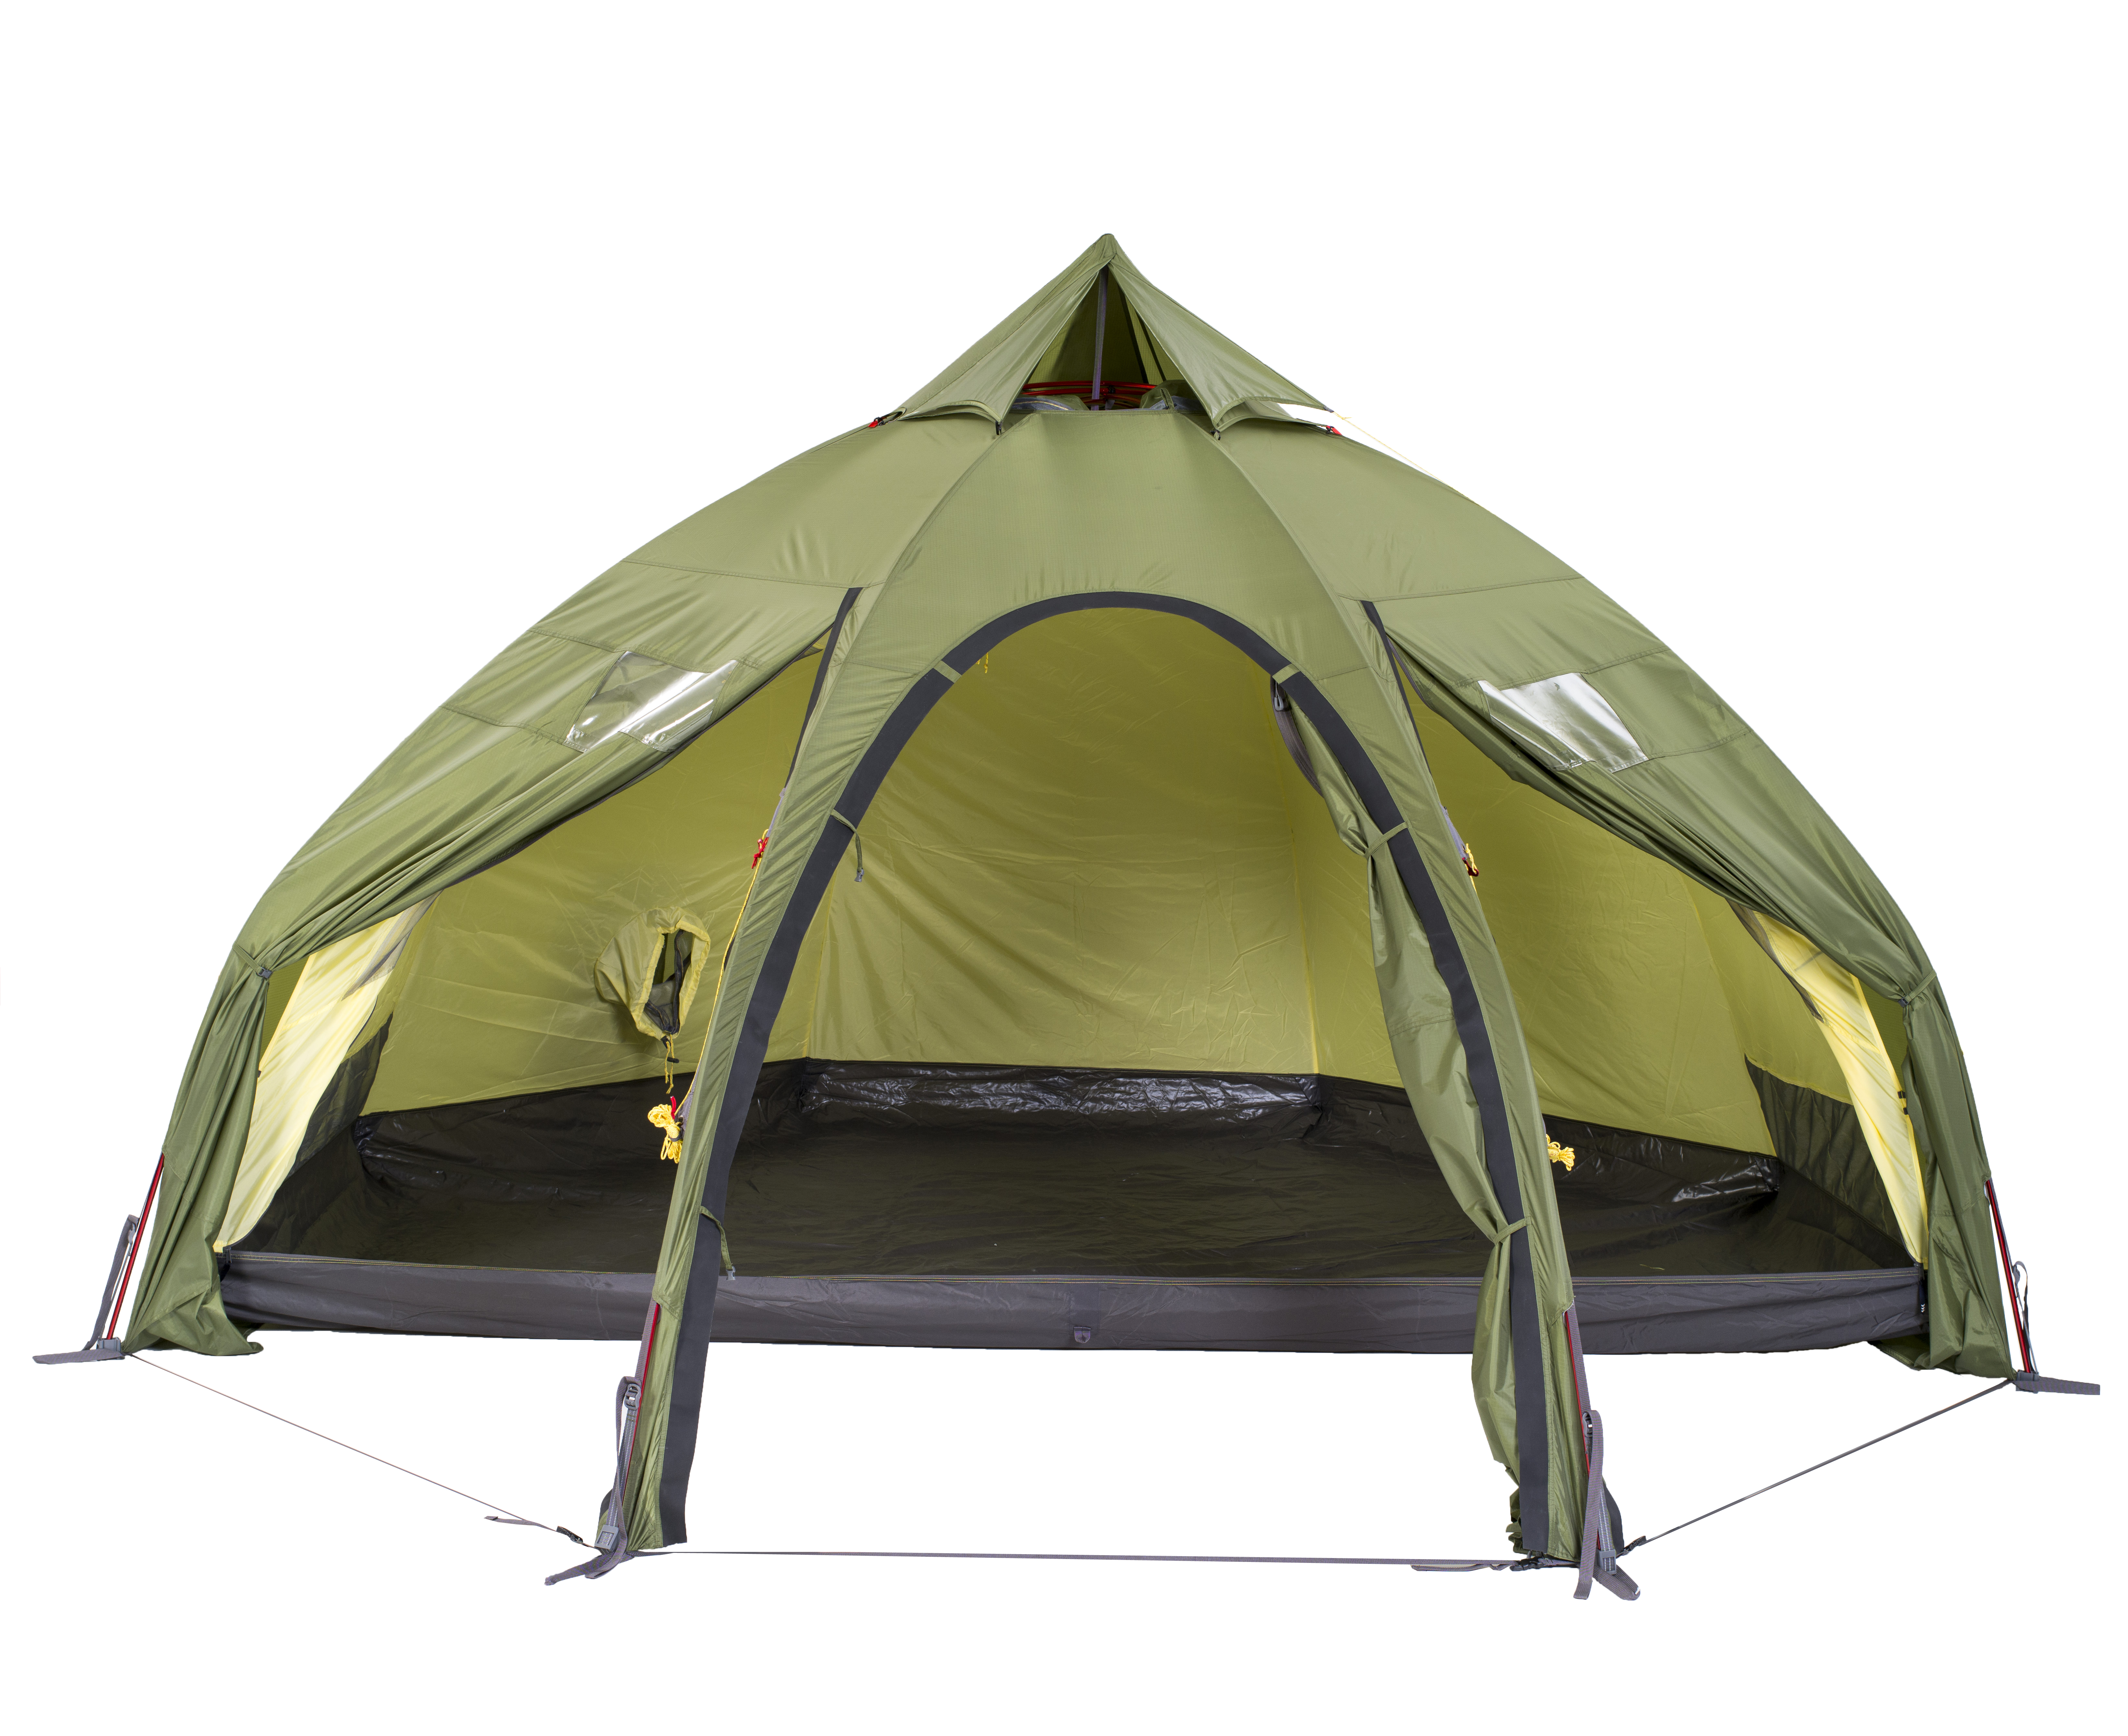 VarangerDomeOpenW_innertentClosed Varanger DomeFloorStove VarangerDomeOpenW_innertentOpen Varanger Dome  sc 1 st  Wild Coast Tents - WordPress.com & Helsport | Wild Coast Tents